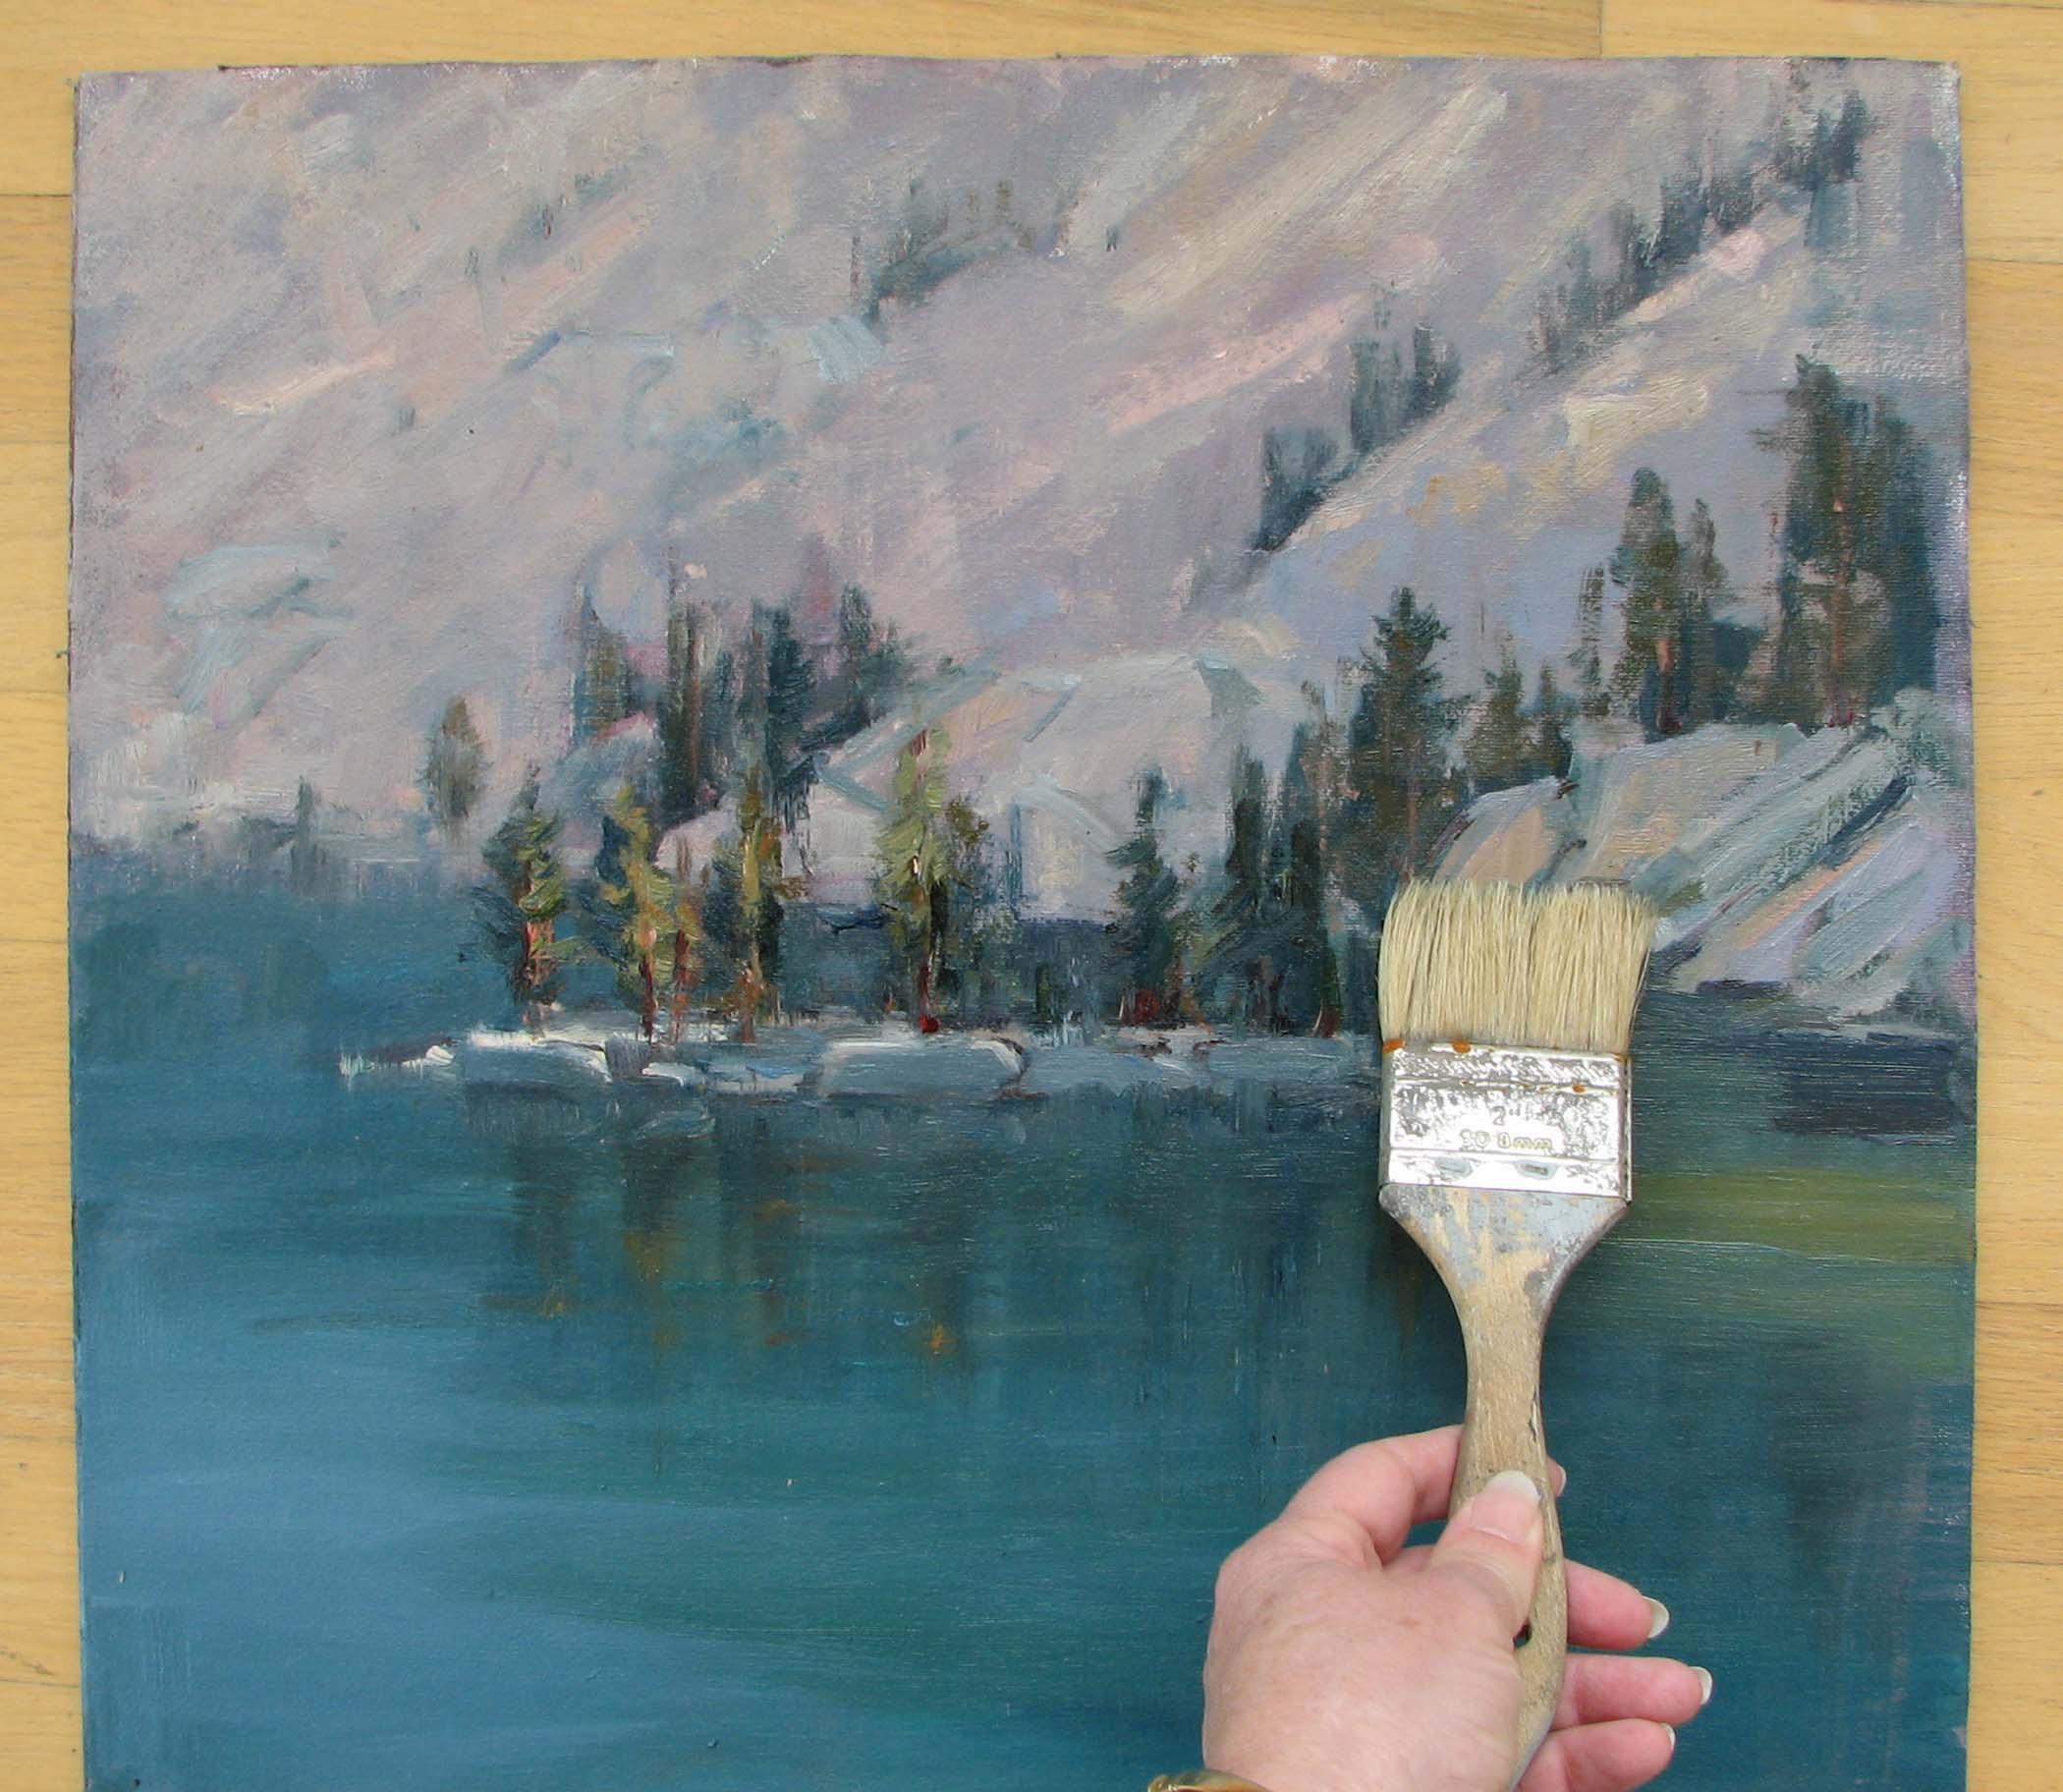 brush varnish down the painting